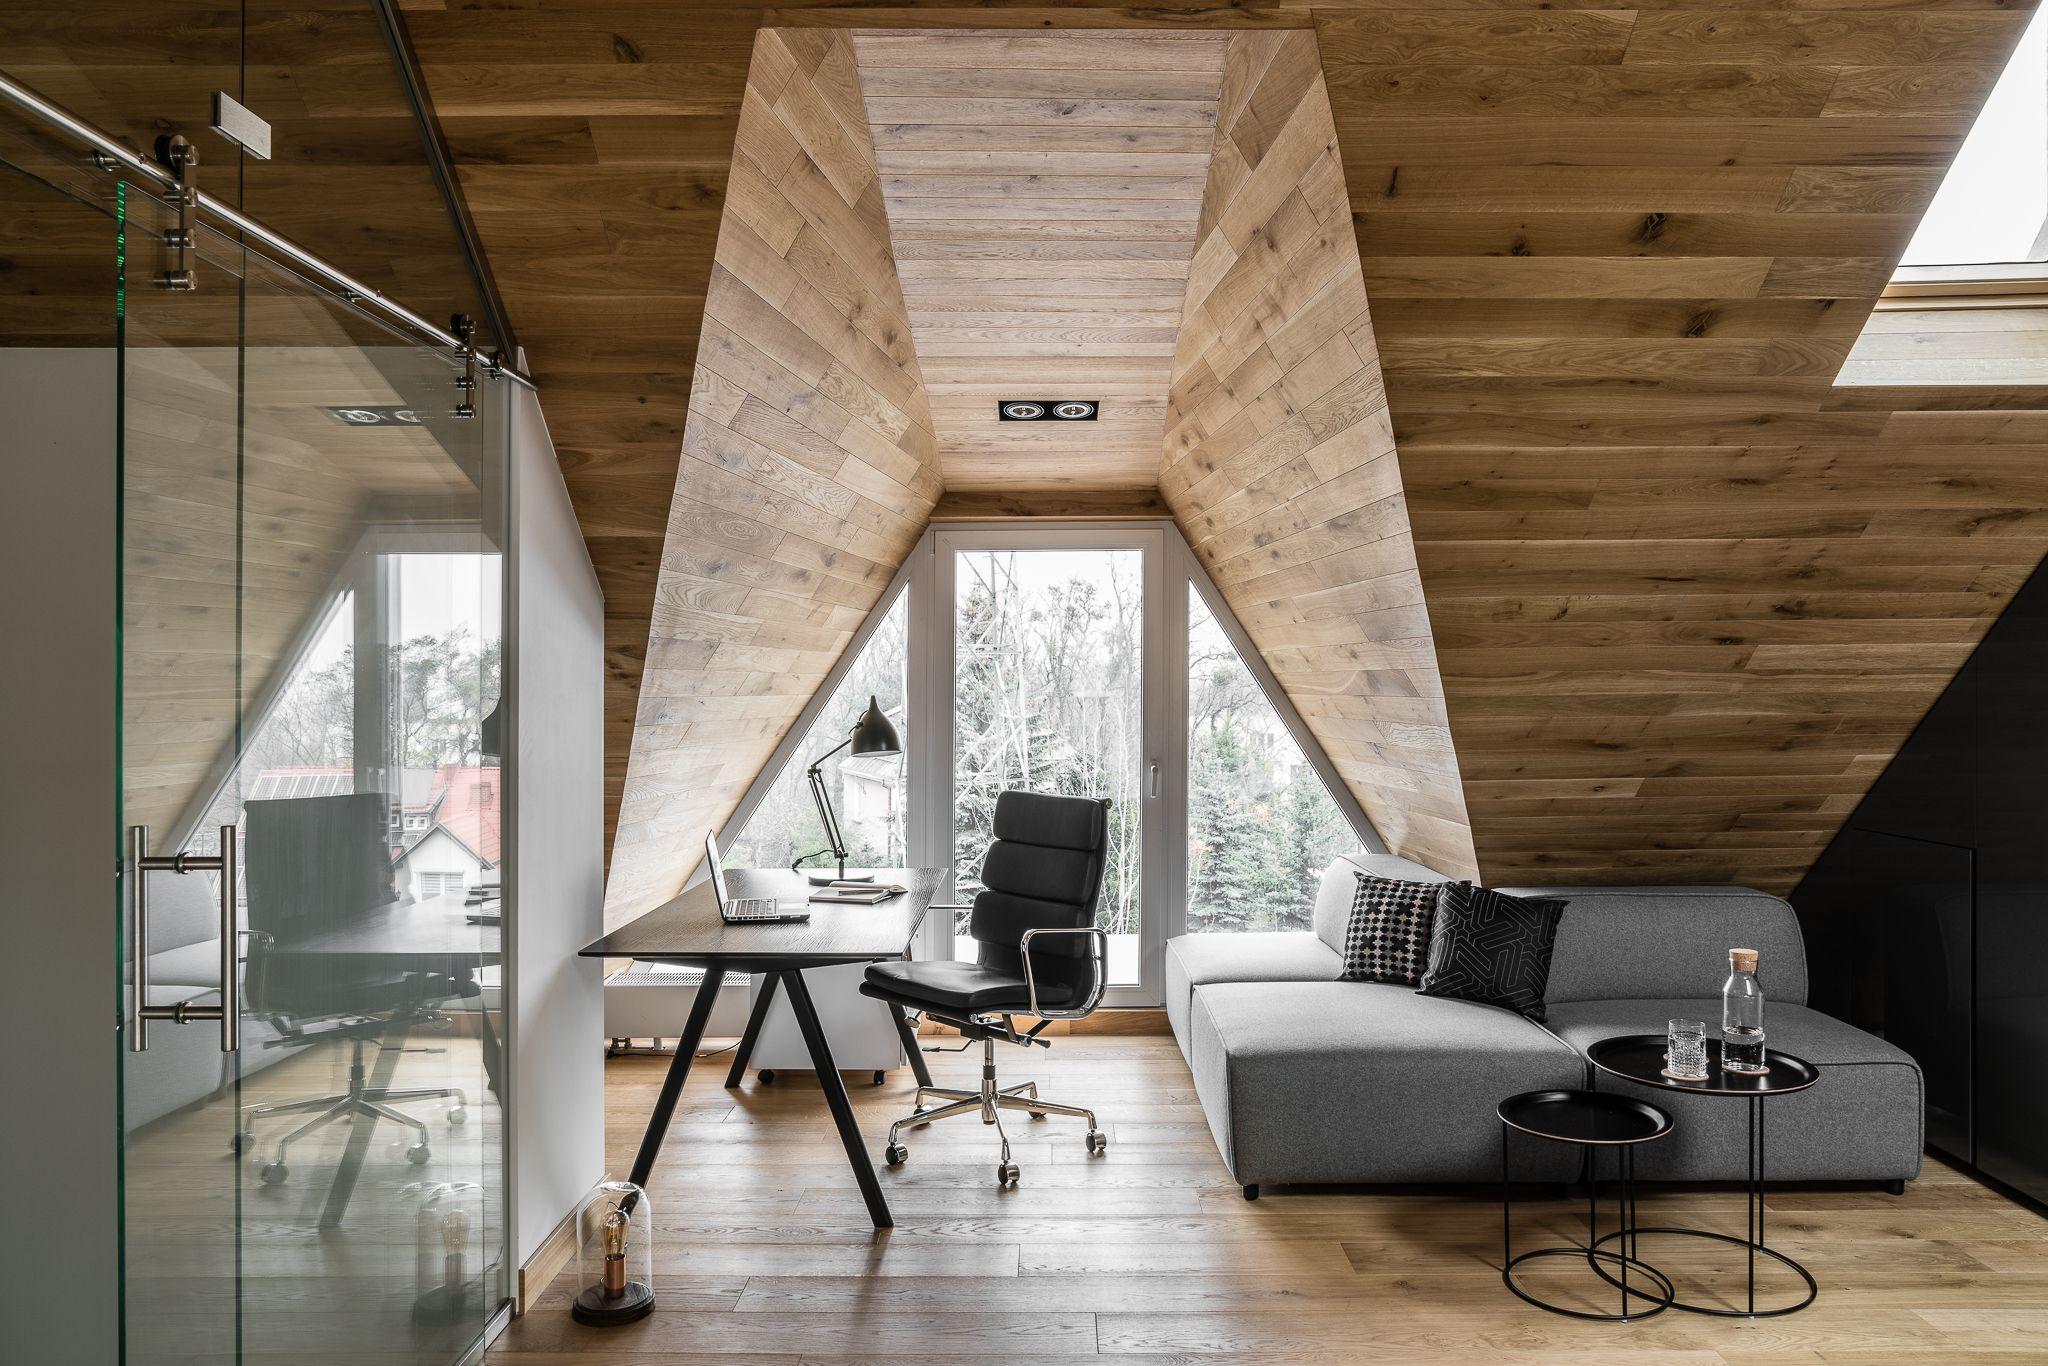 Carmo sofa work space bedroom BoConcept Trójmiasto Realizacja ...